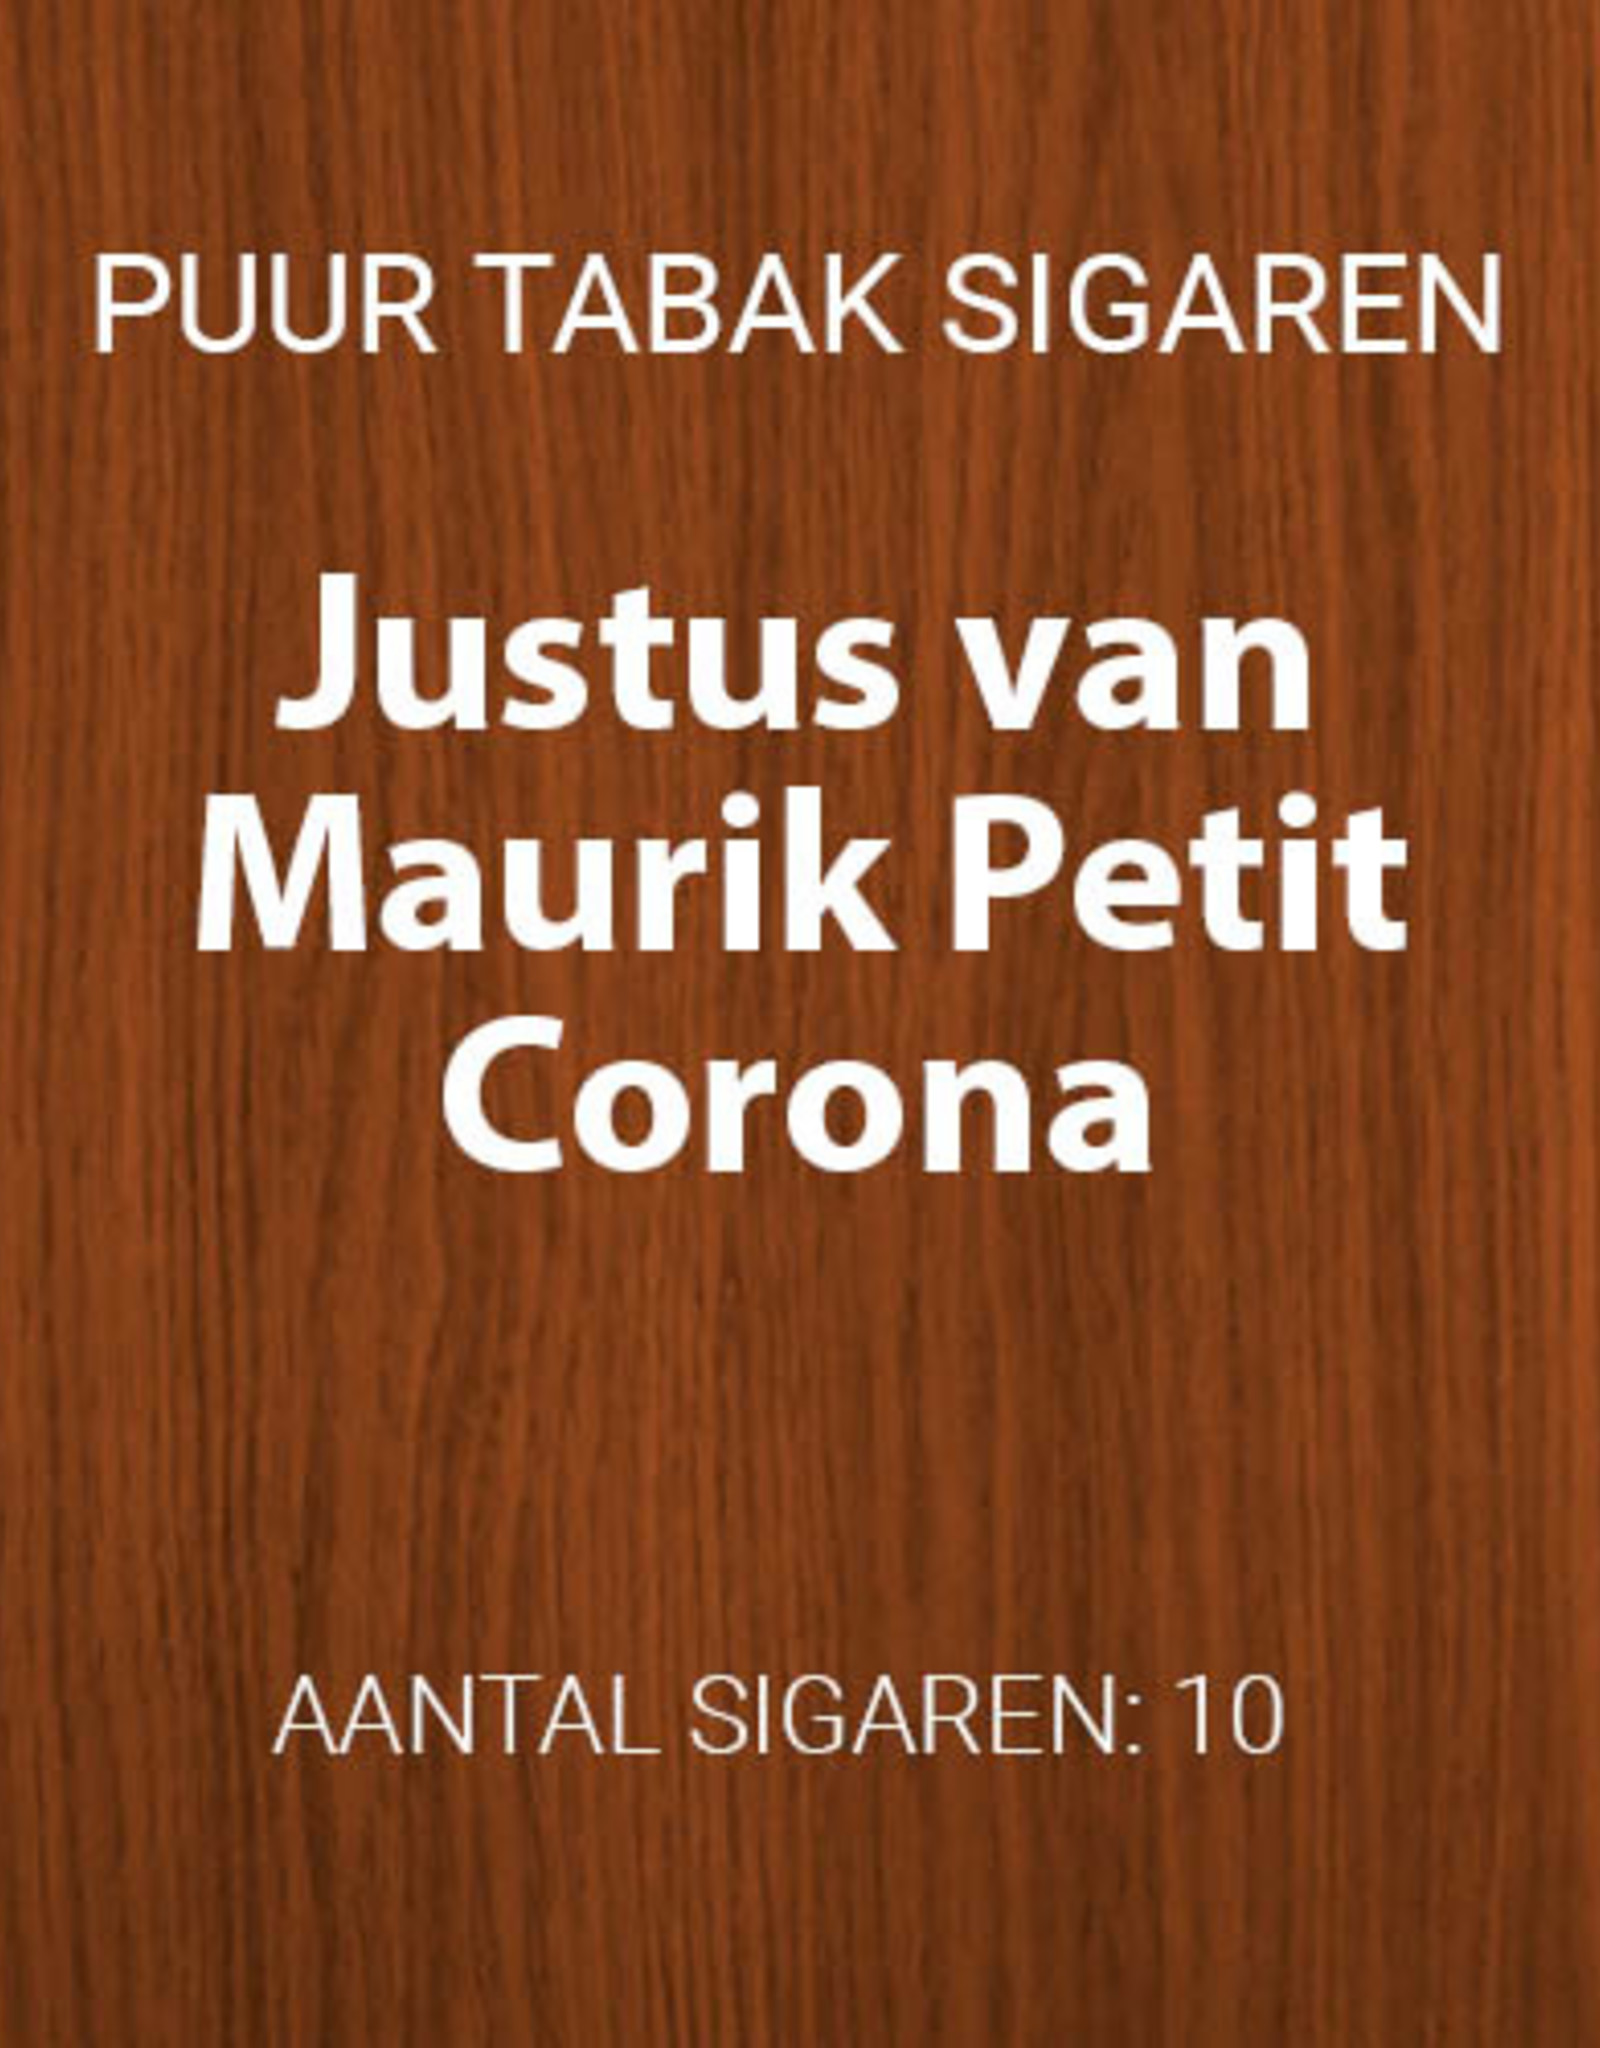 Justus van Maurik Petit Corona